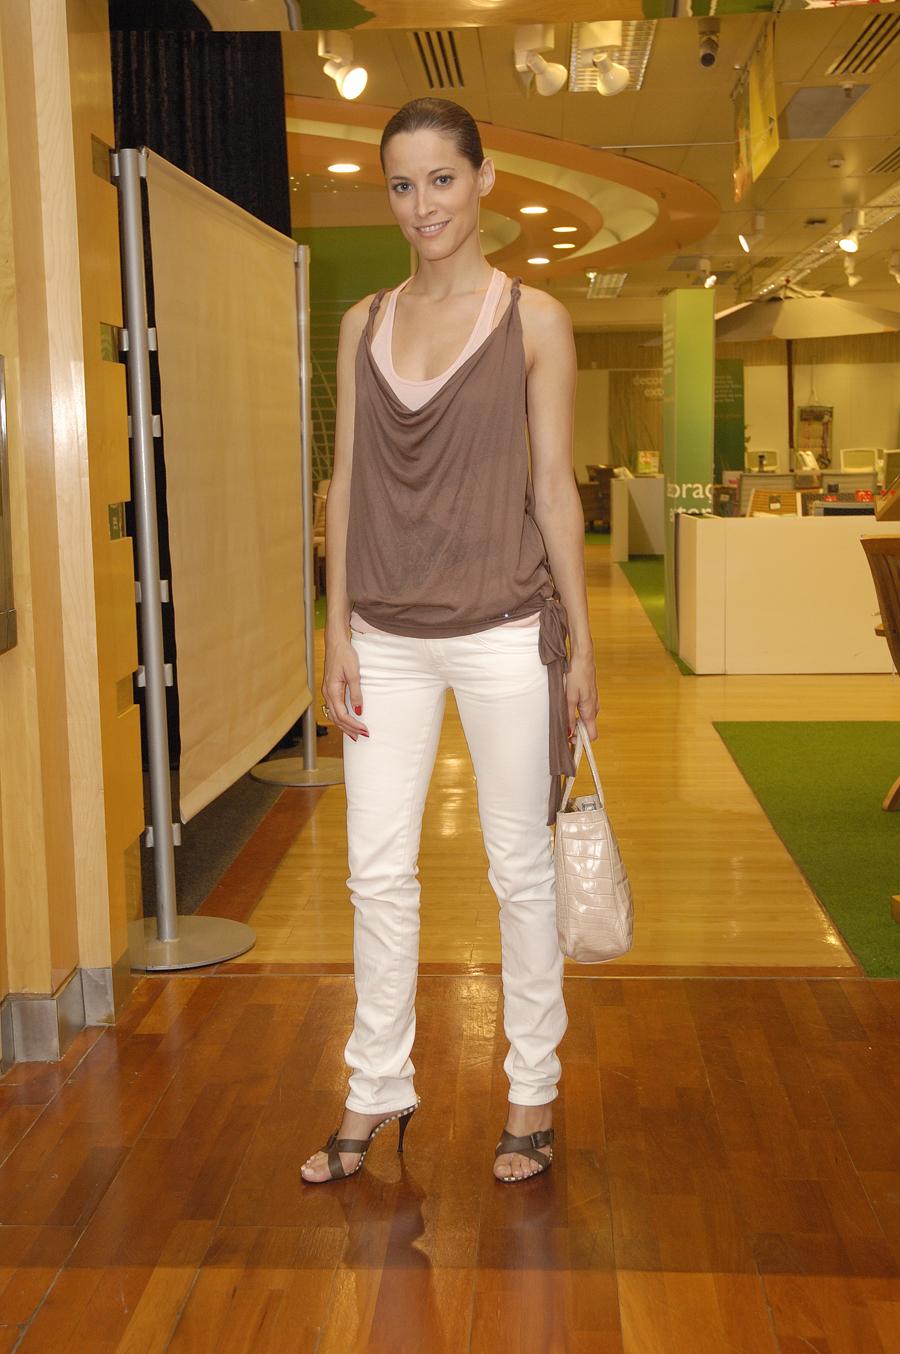 http://pics.wikifeet.com/Maria-Jo%C3%A3o-Bastos-Feet-877919.jpg